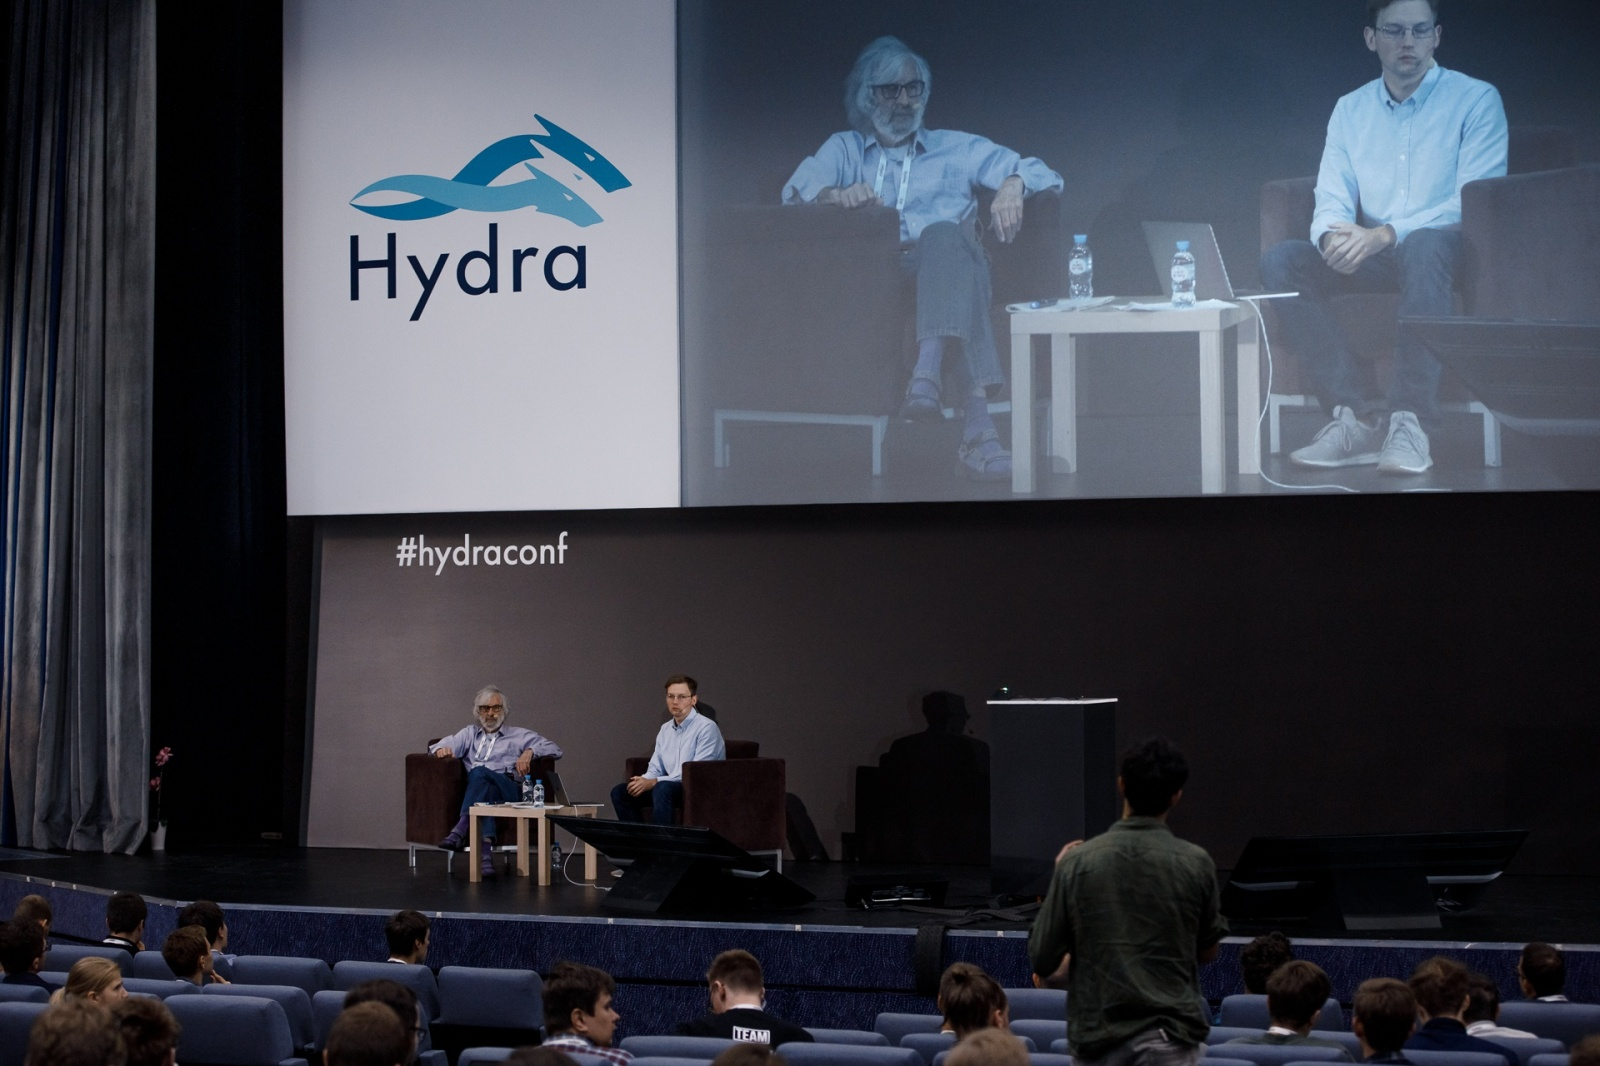 Три лауреата премии Дейкстры: как прошли Hydra 2019 и SPTDC 2019 - 9